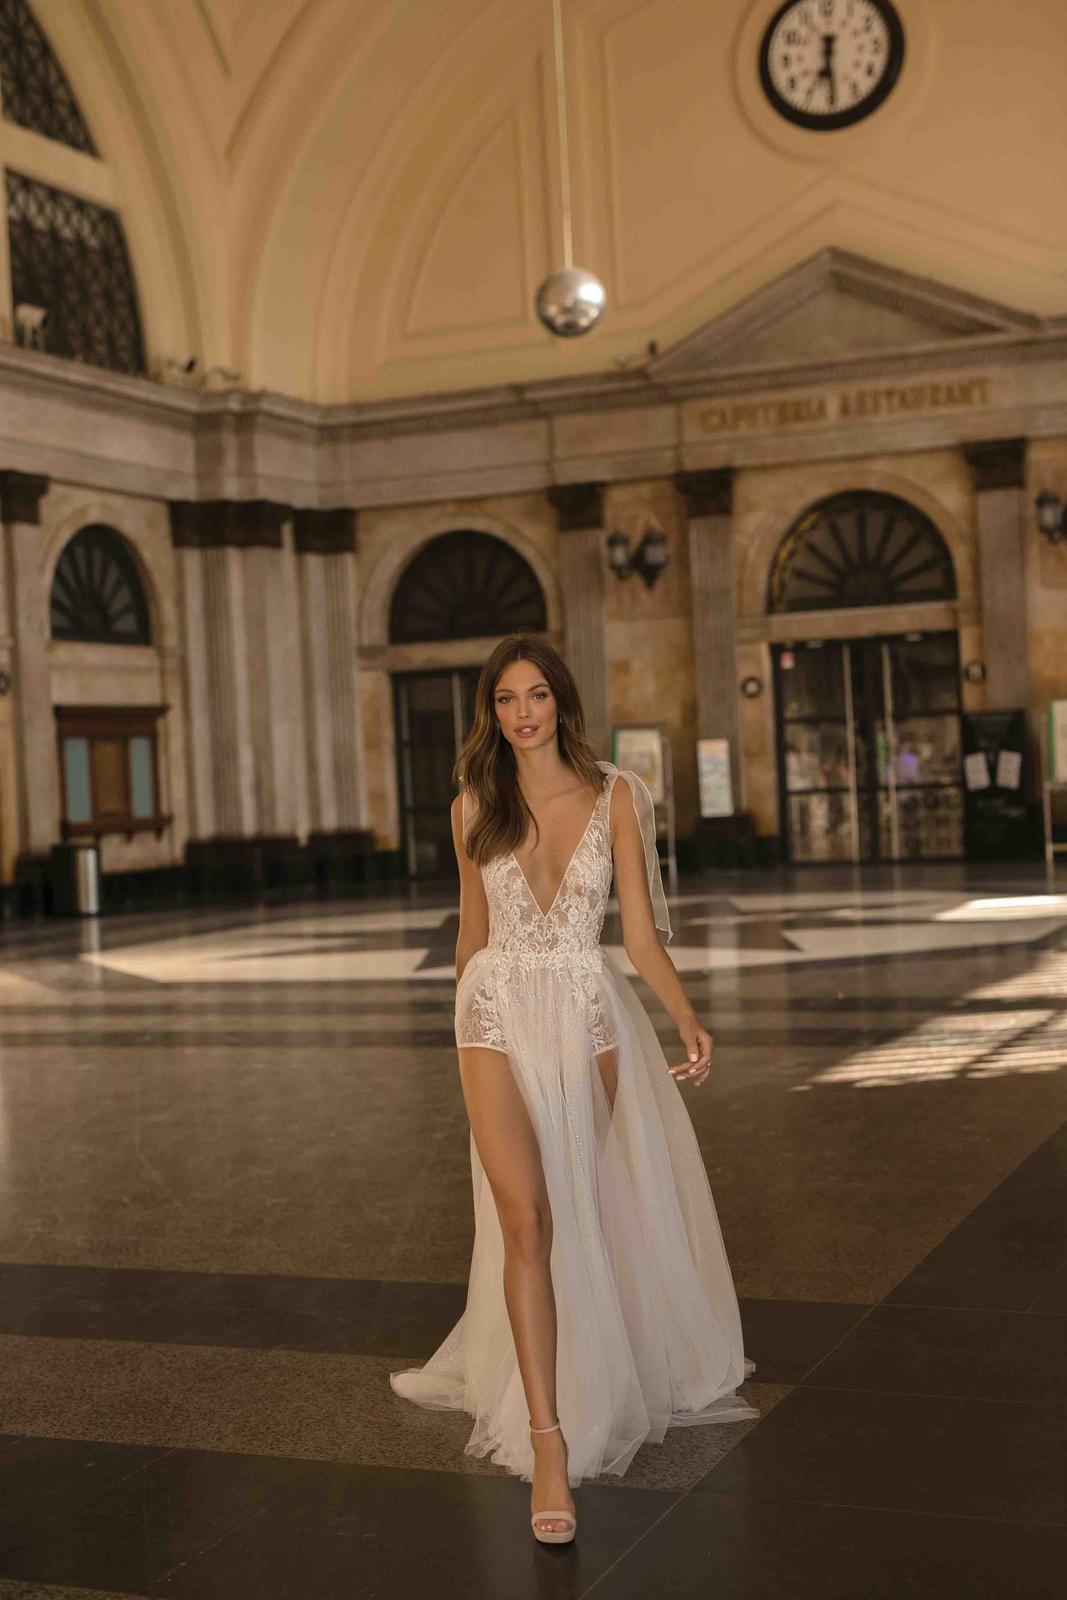 Muse by Berta * Svadobné šaty z kolekcií na rok 2019 - Obrázok č. 23